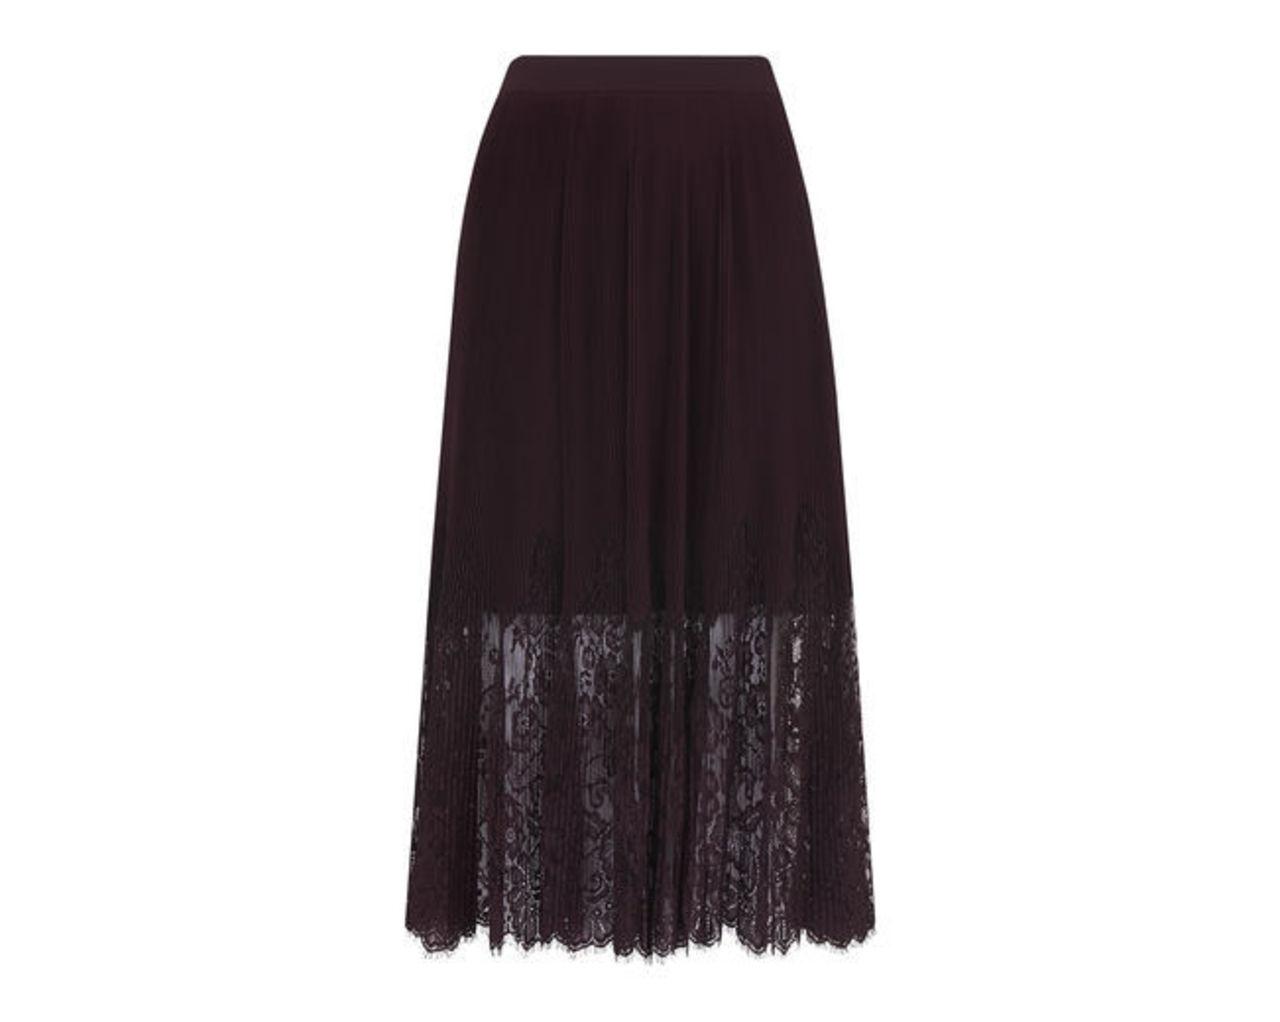 Lillian Pleated Lace Skirt